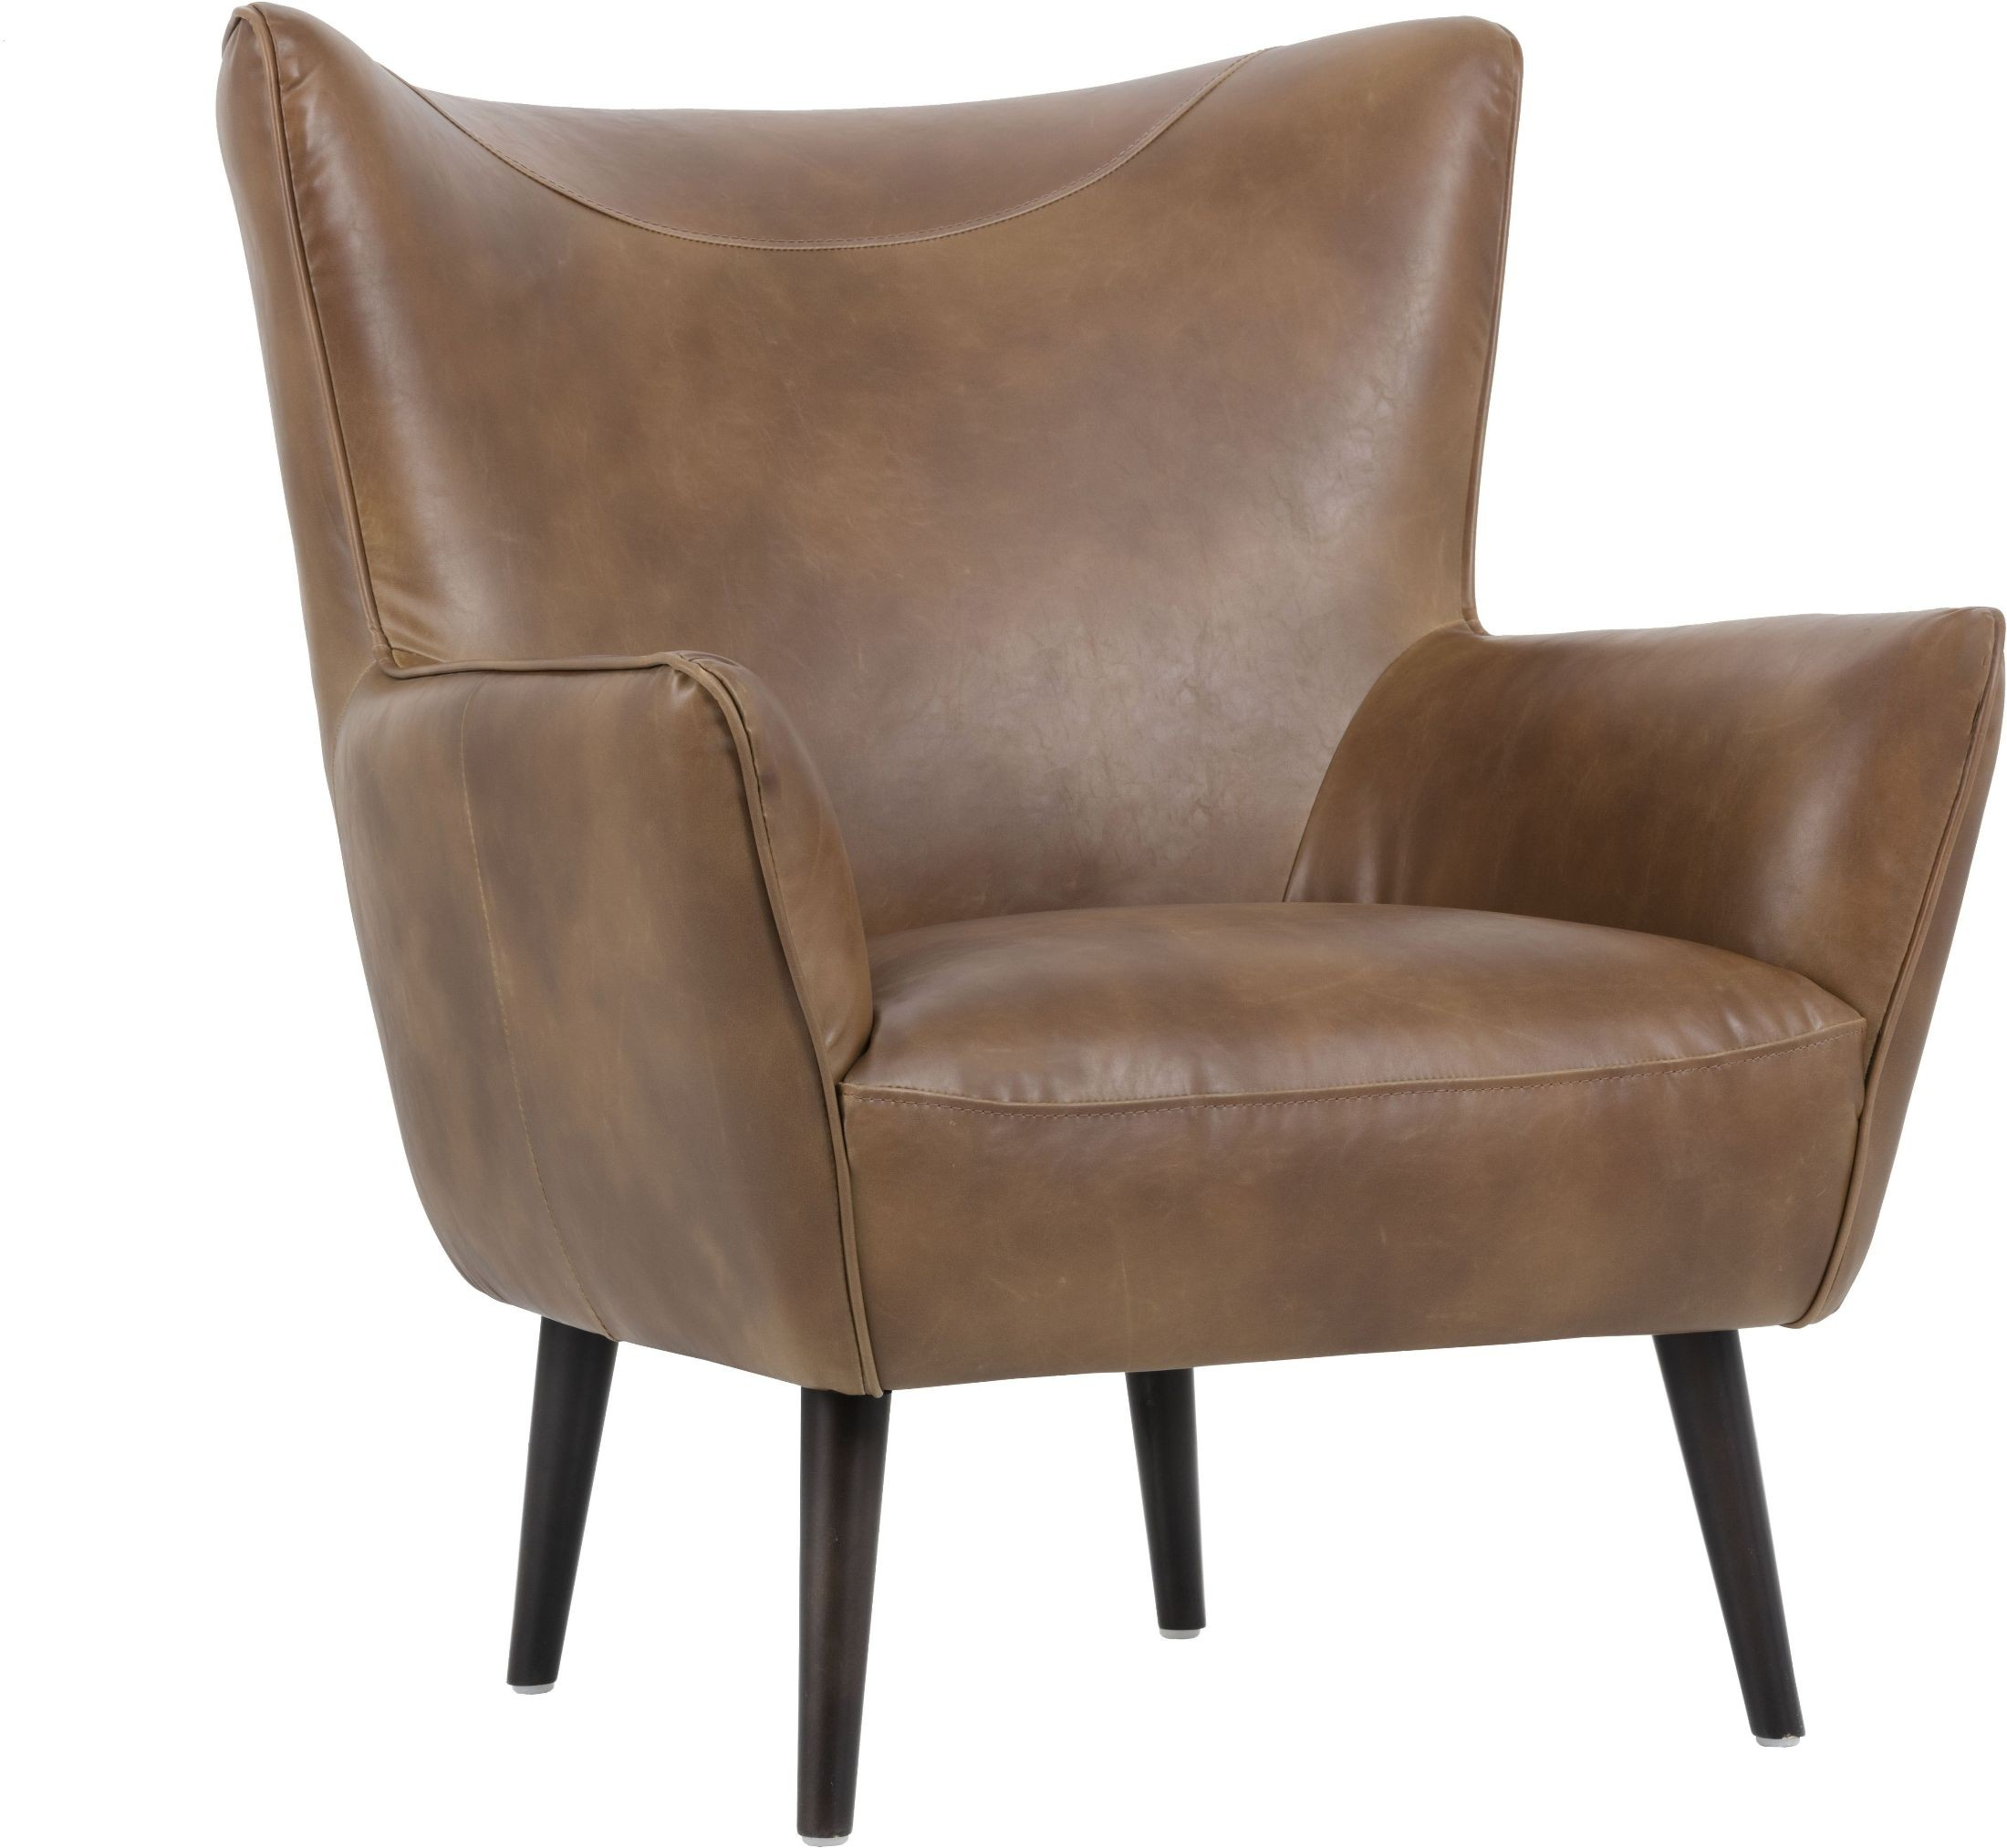 Luther Tobacco Tan Occasional Chair 101966 Sunpan Modern